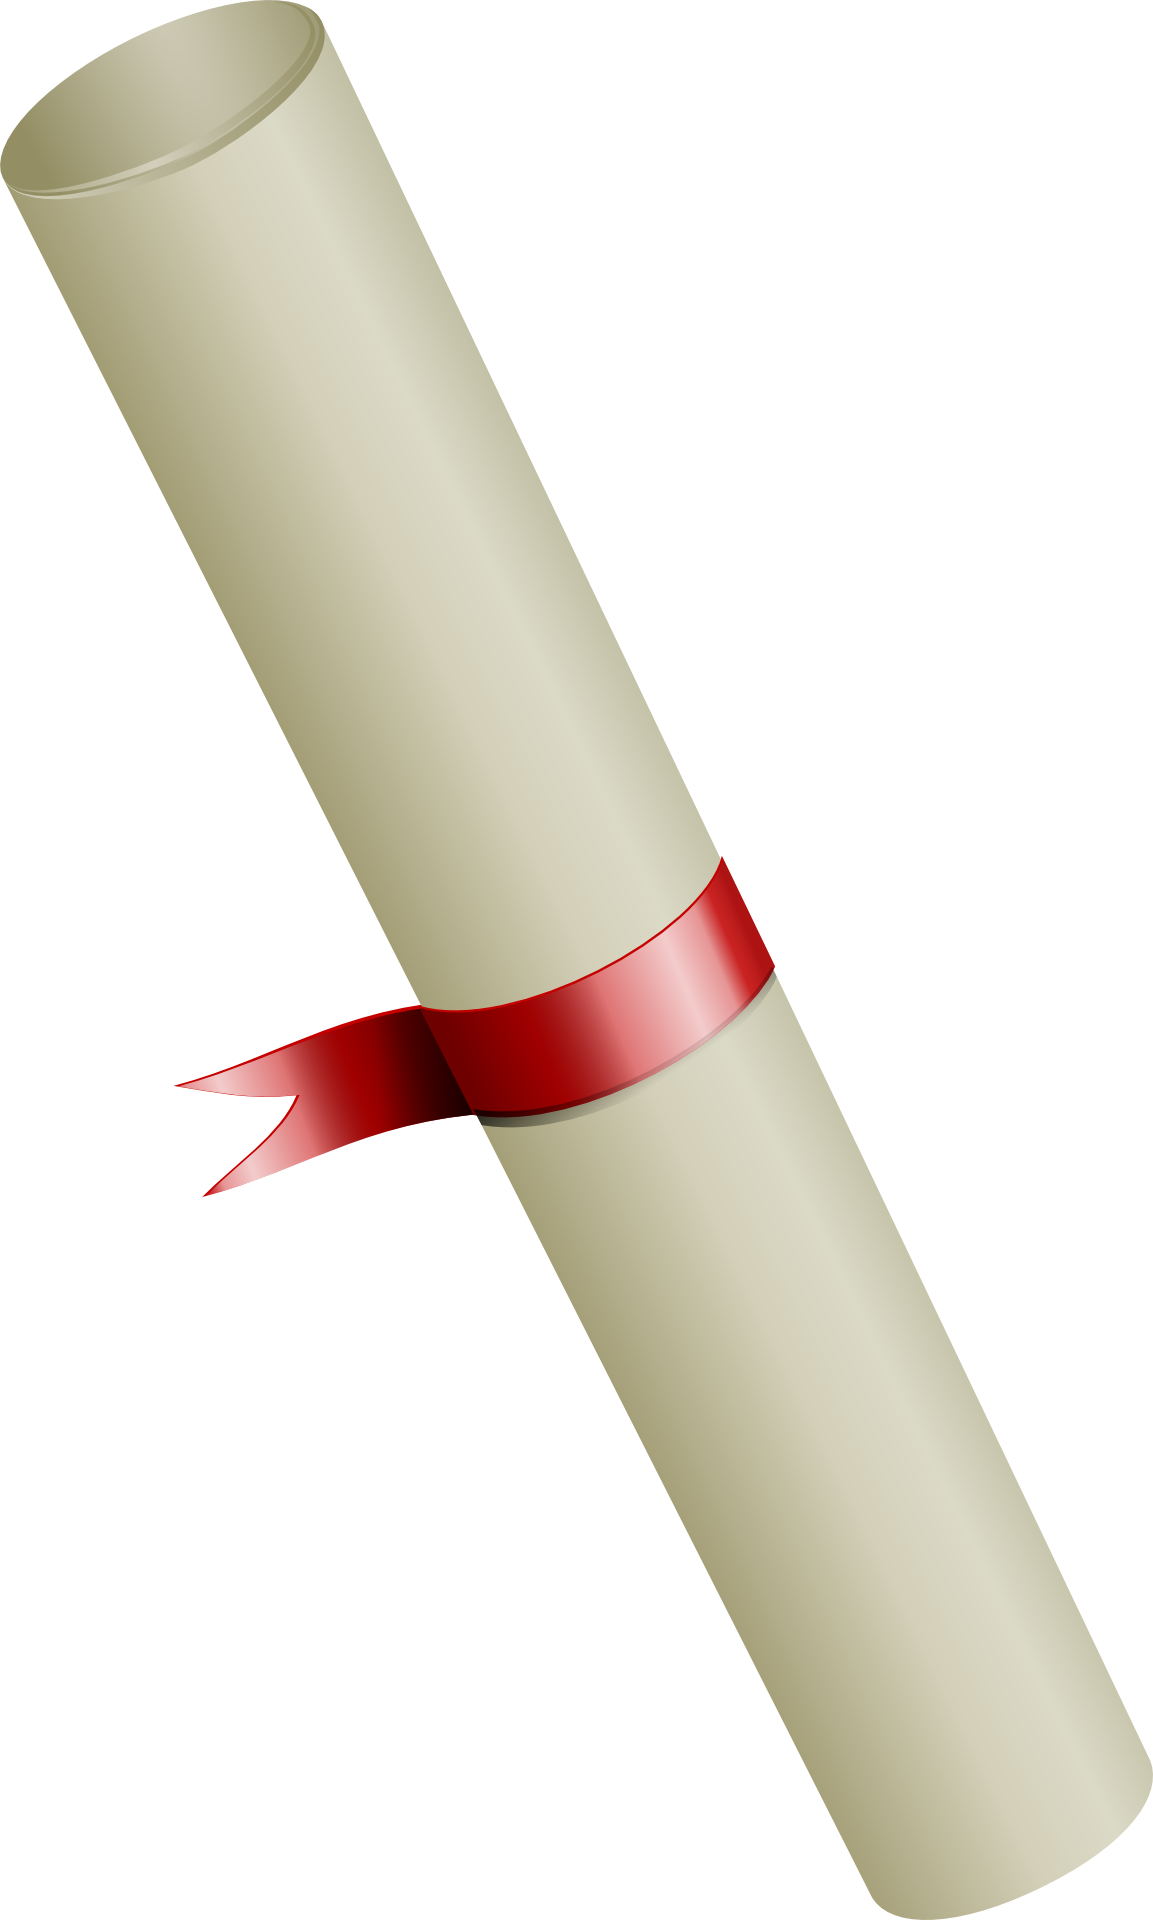 scroll-32278